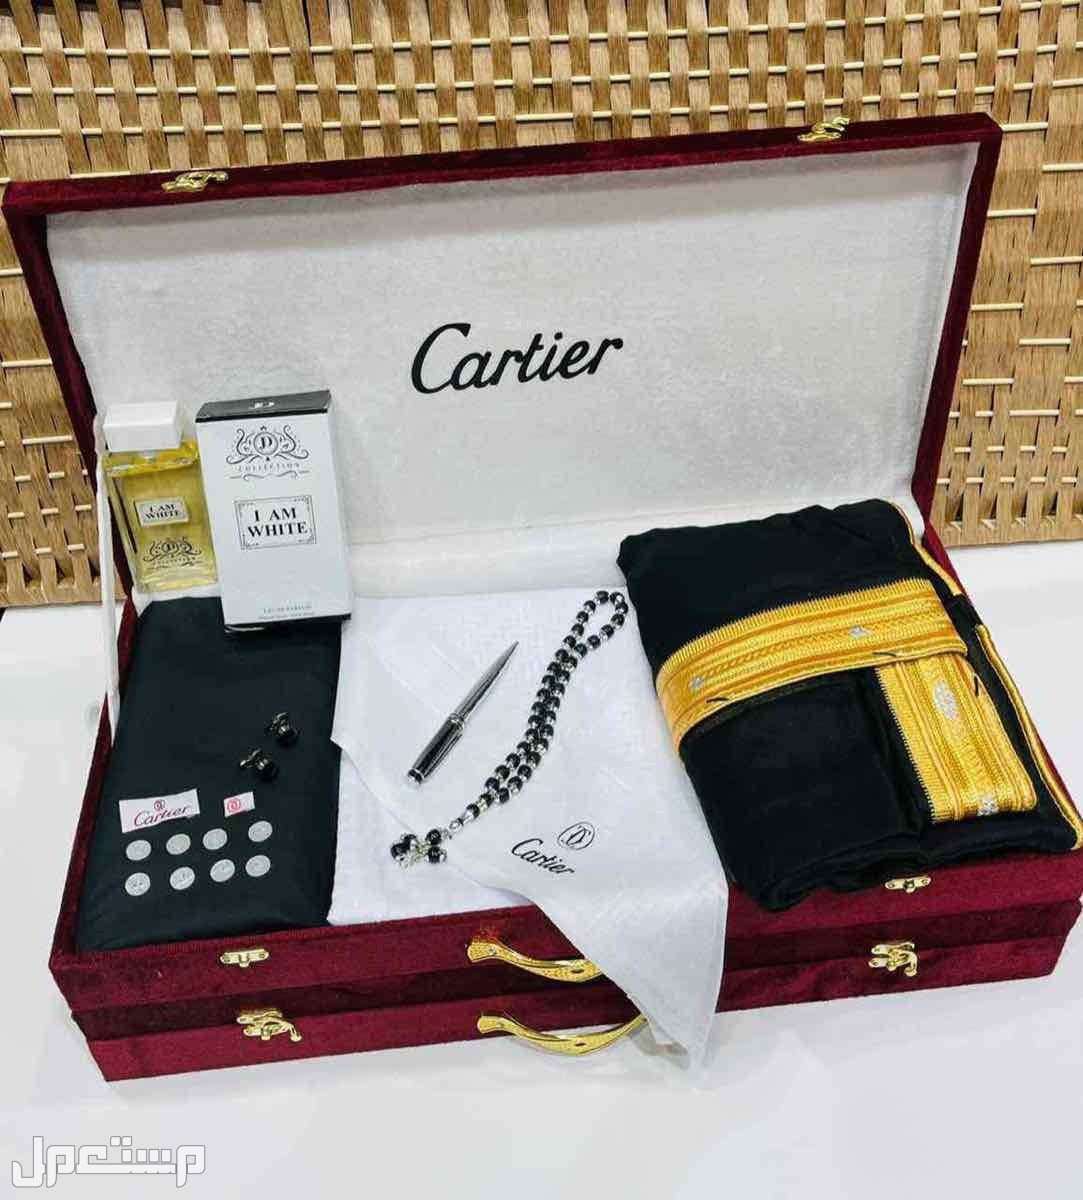 بوكس هدايا رجاليه كارتير قماش شماغ بشت قلم كبك